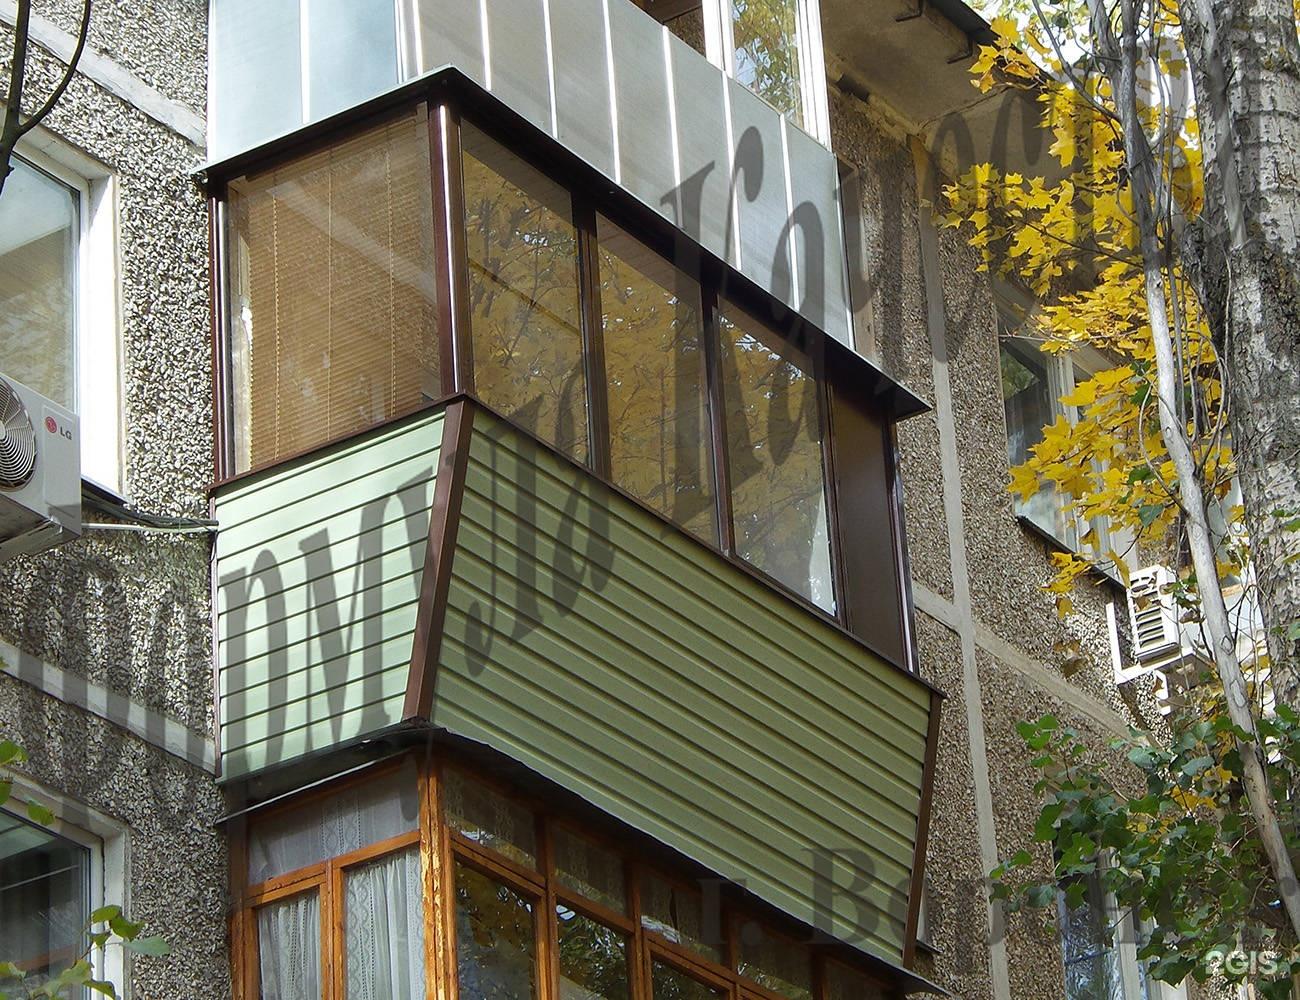 Конструкции проведал на балкон или лоджию в воронеже от комп.